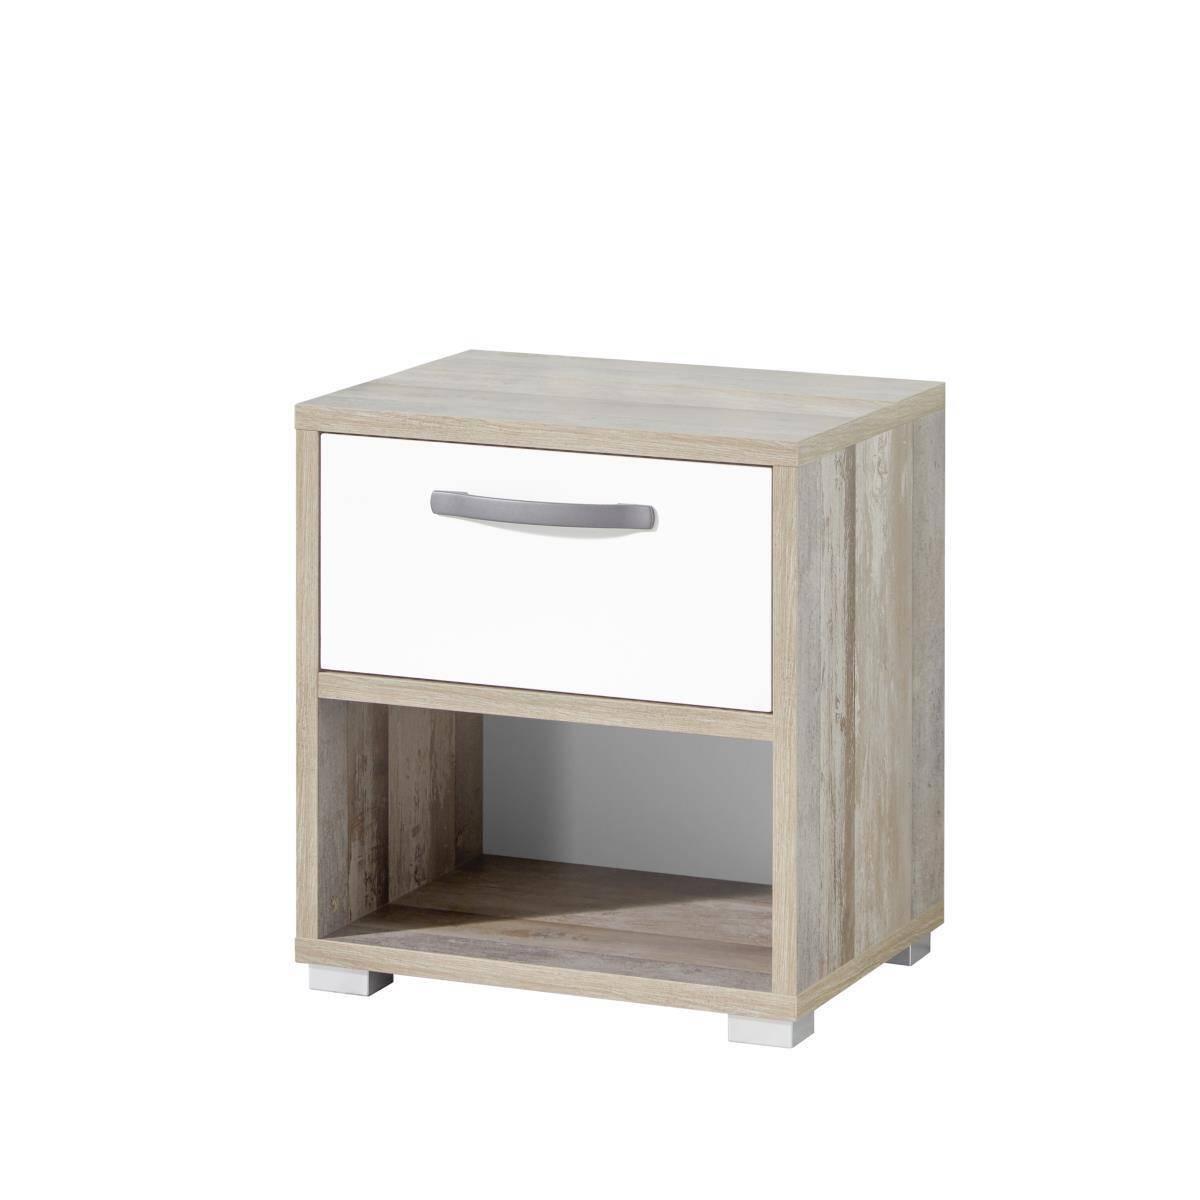 Jugendzimmer Nachtkommode MAUI-78 Driftwood / weiß B:H:T ca. 49x52x41cm